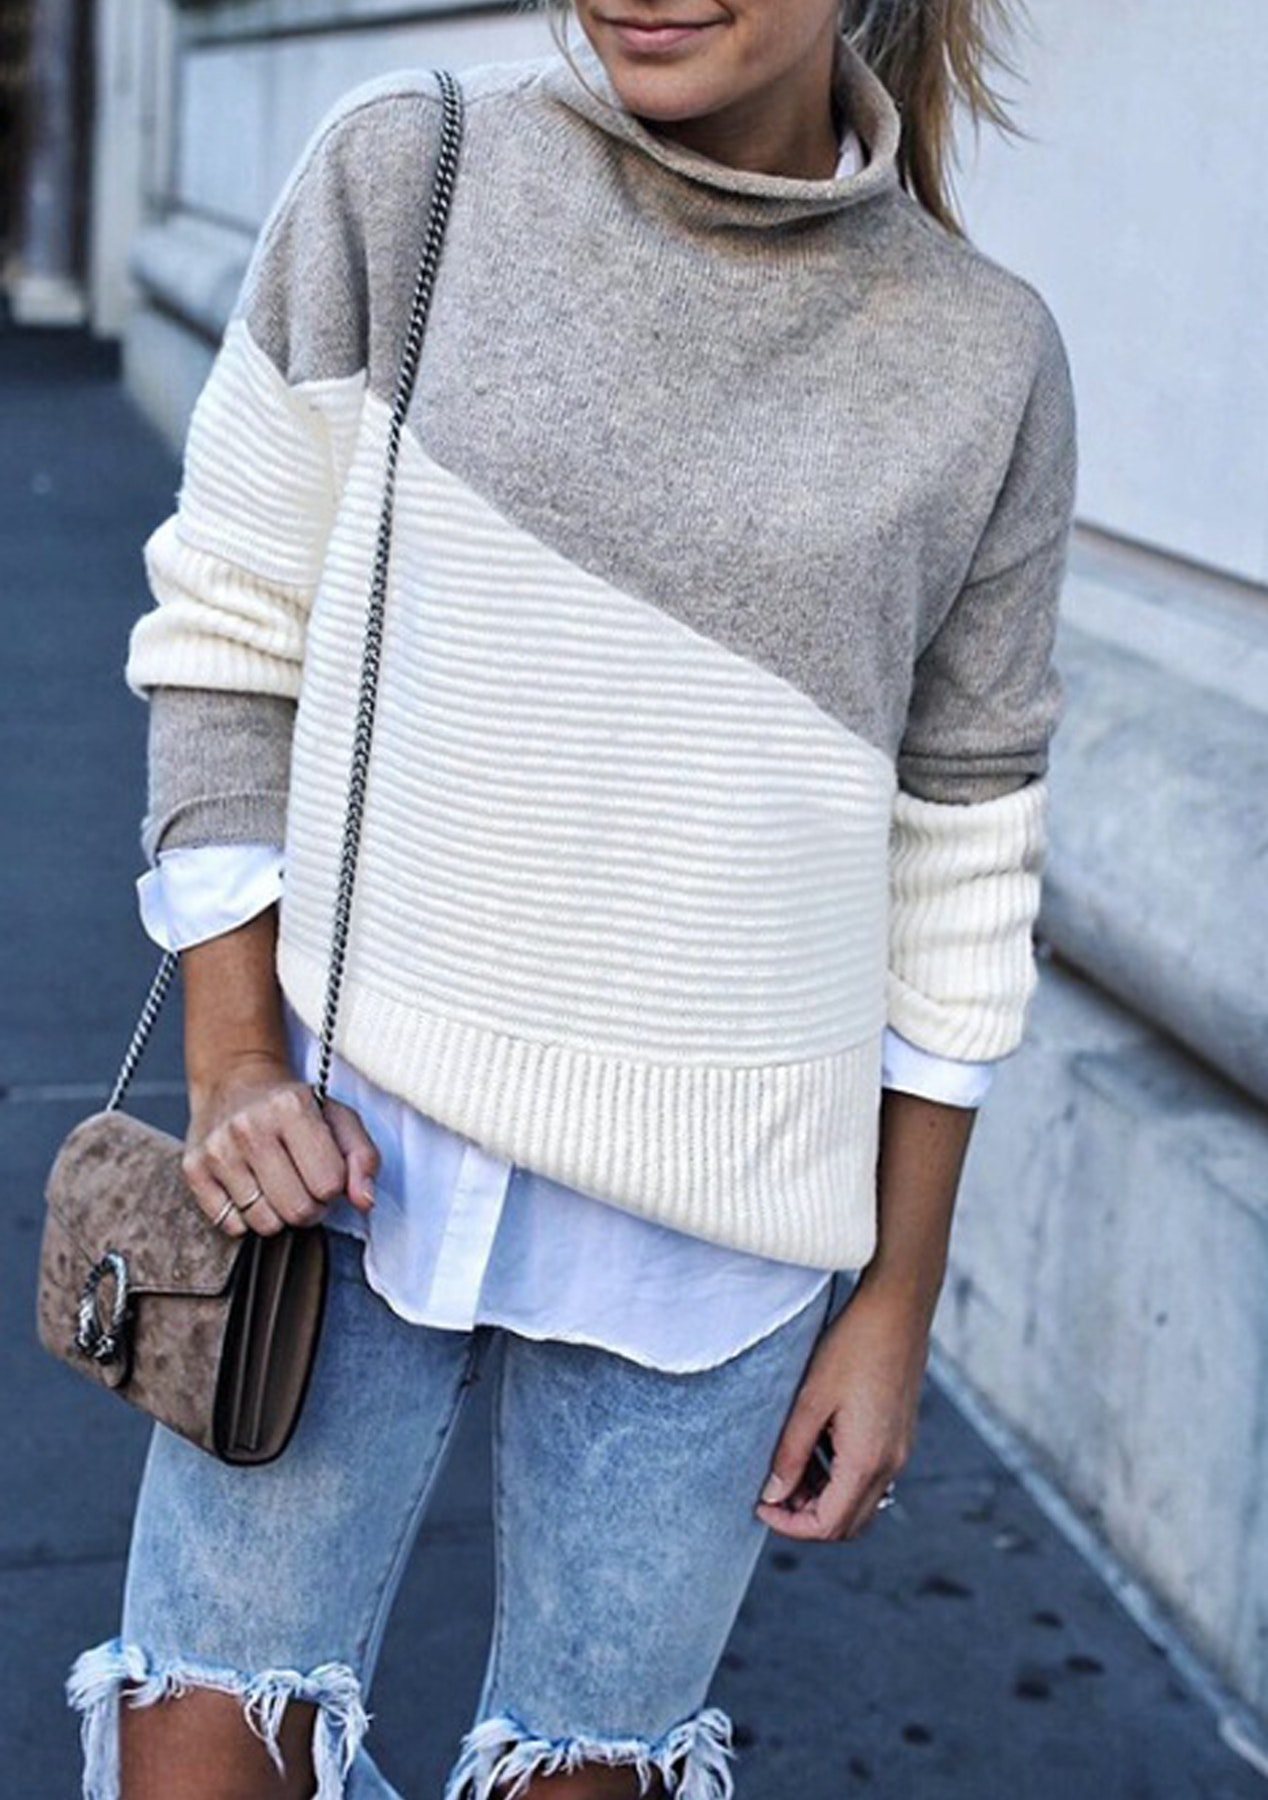 4837fa33bb2b Fashion Edit. - Hiro Jumper - Marle Grey - New For Autumn Under  50 - Onceit